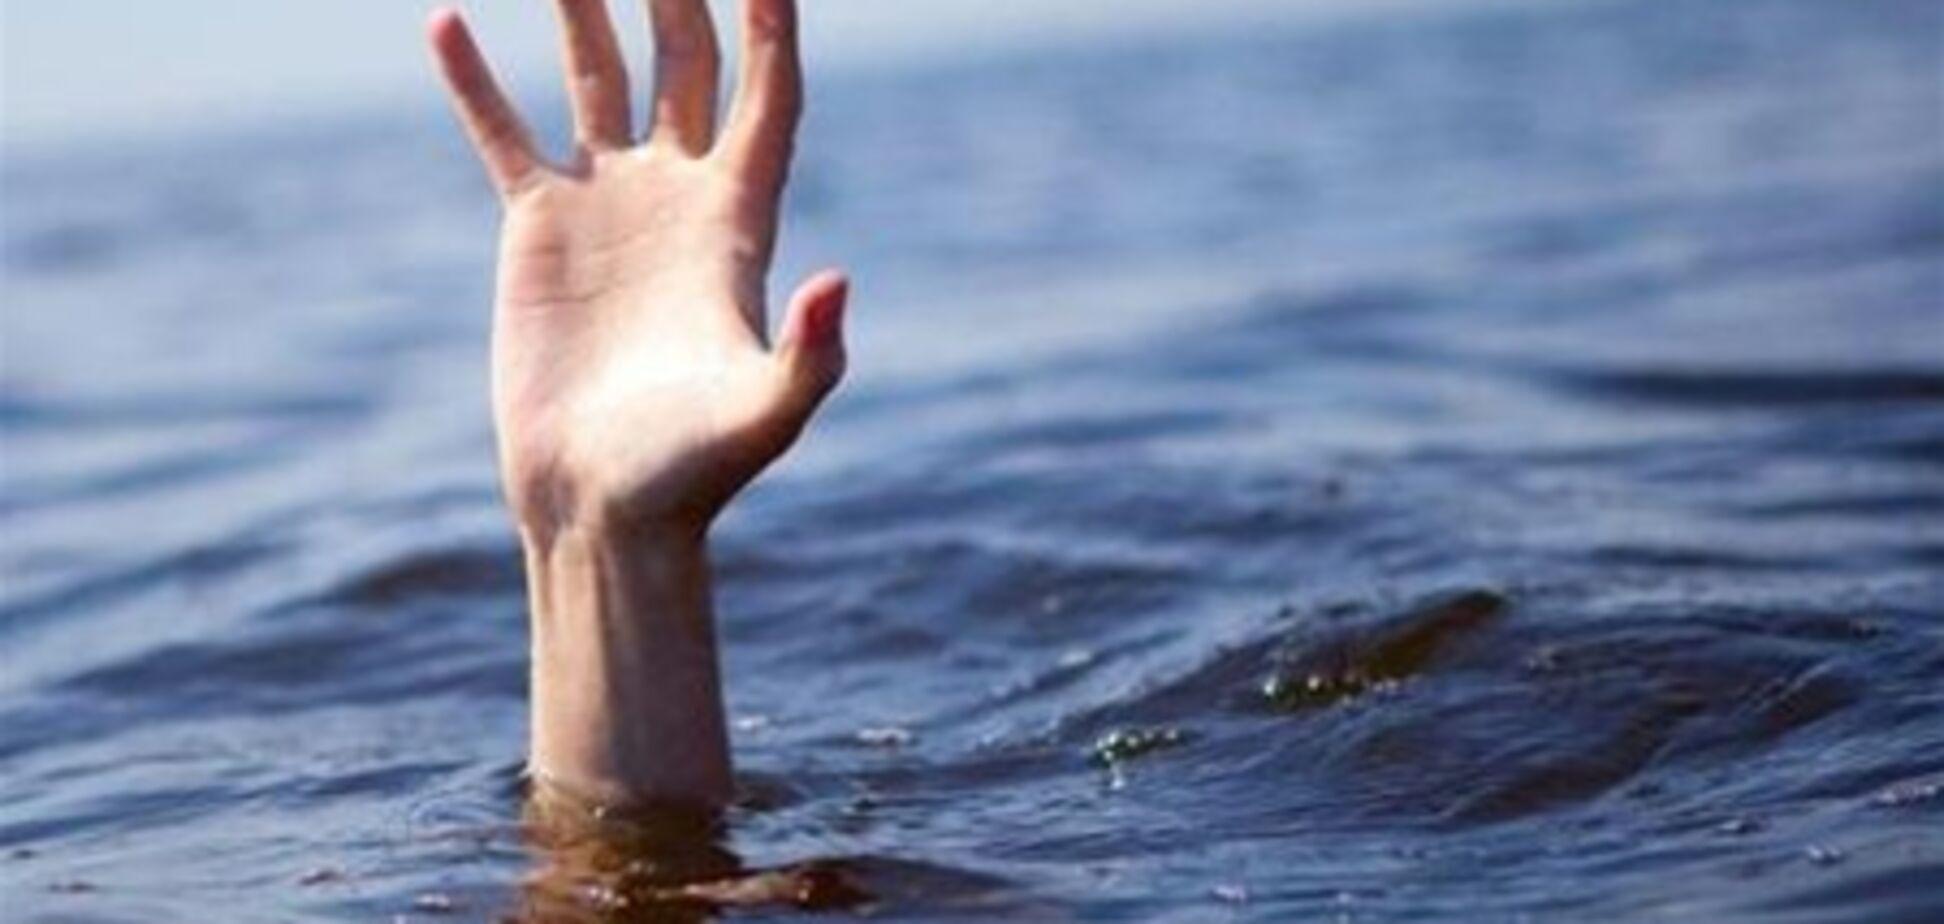 У Бахчисараї потонув удмурт